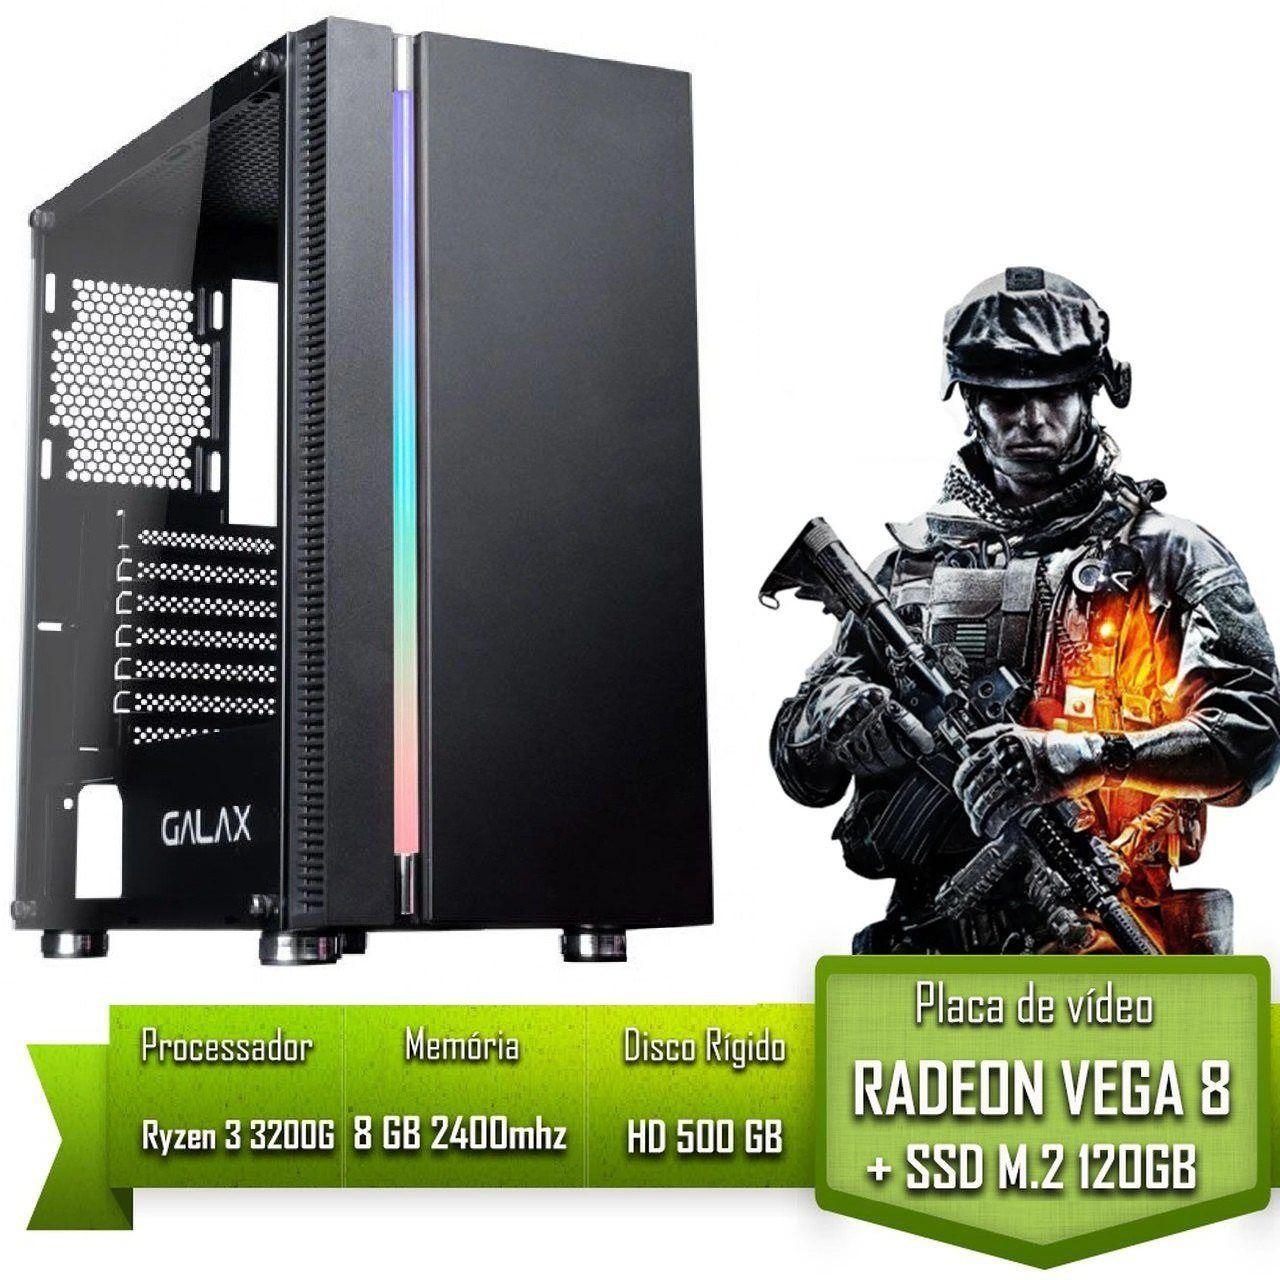 PC GAMER ALLIGATOR GAMING AMD RYZEN 3 3200G / 8GB 2400MHZ / SSD 120GB M.2 /HD 500GB / VEGA 8